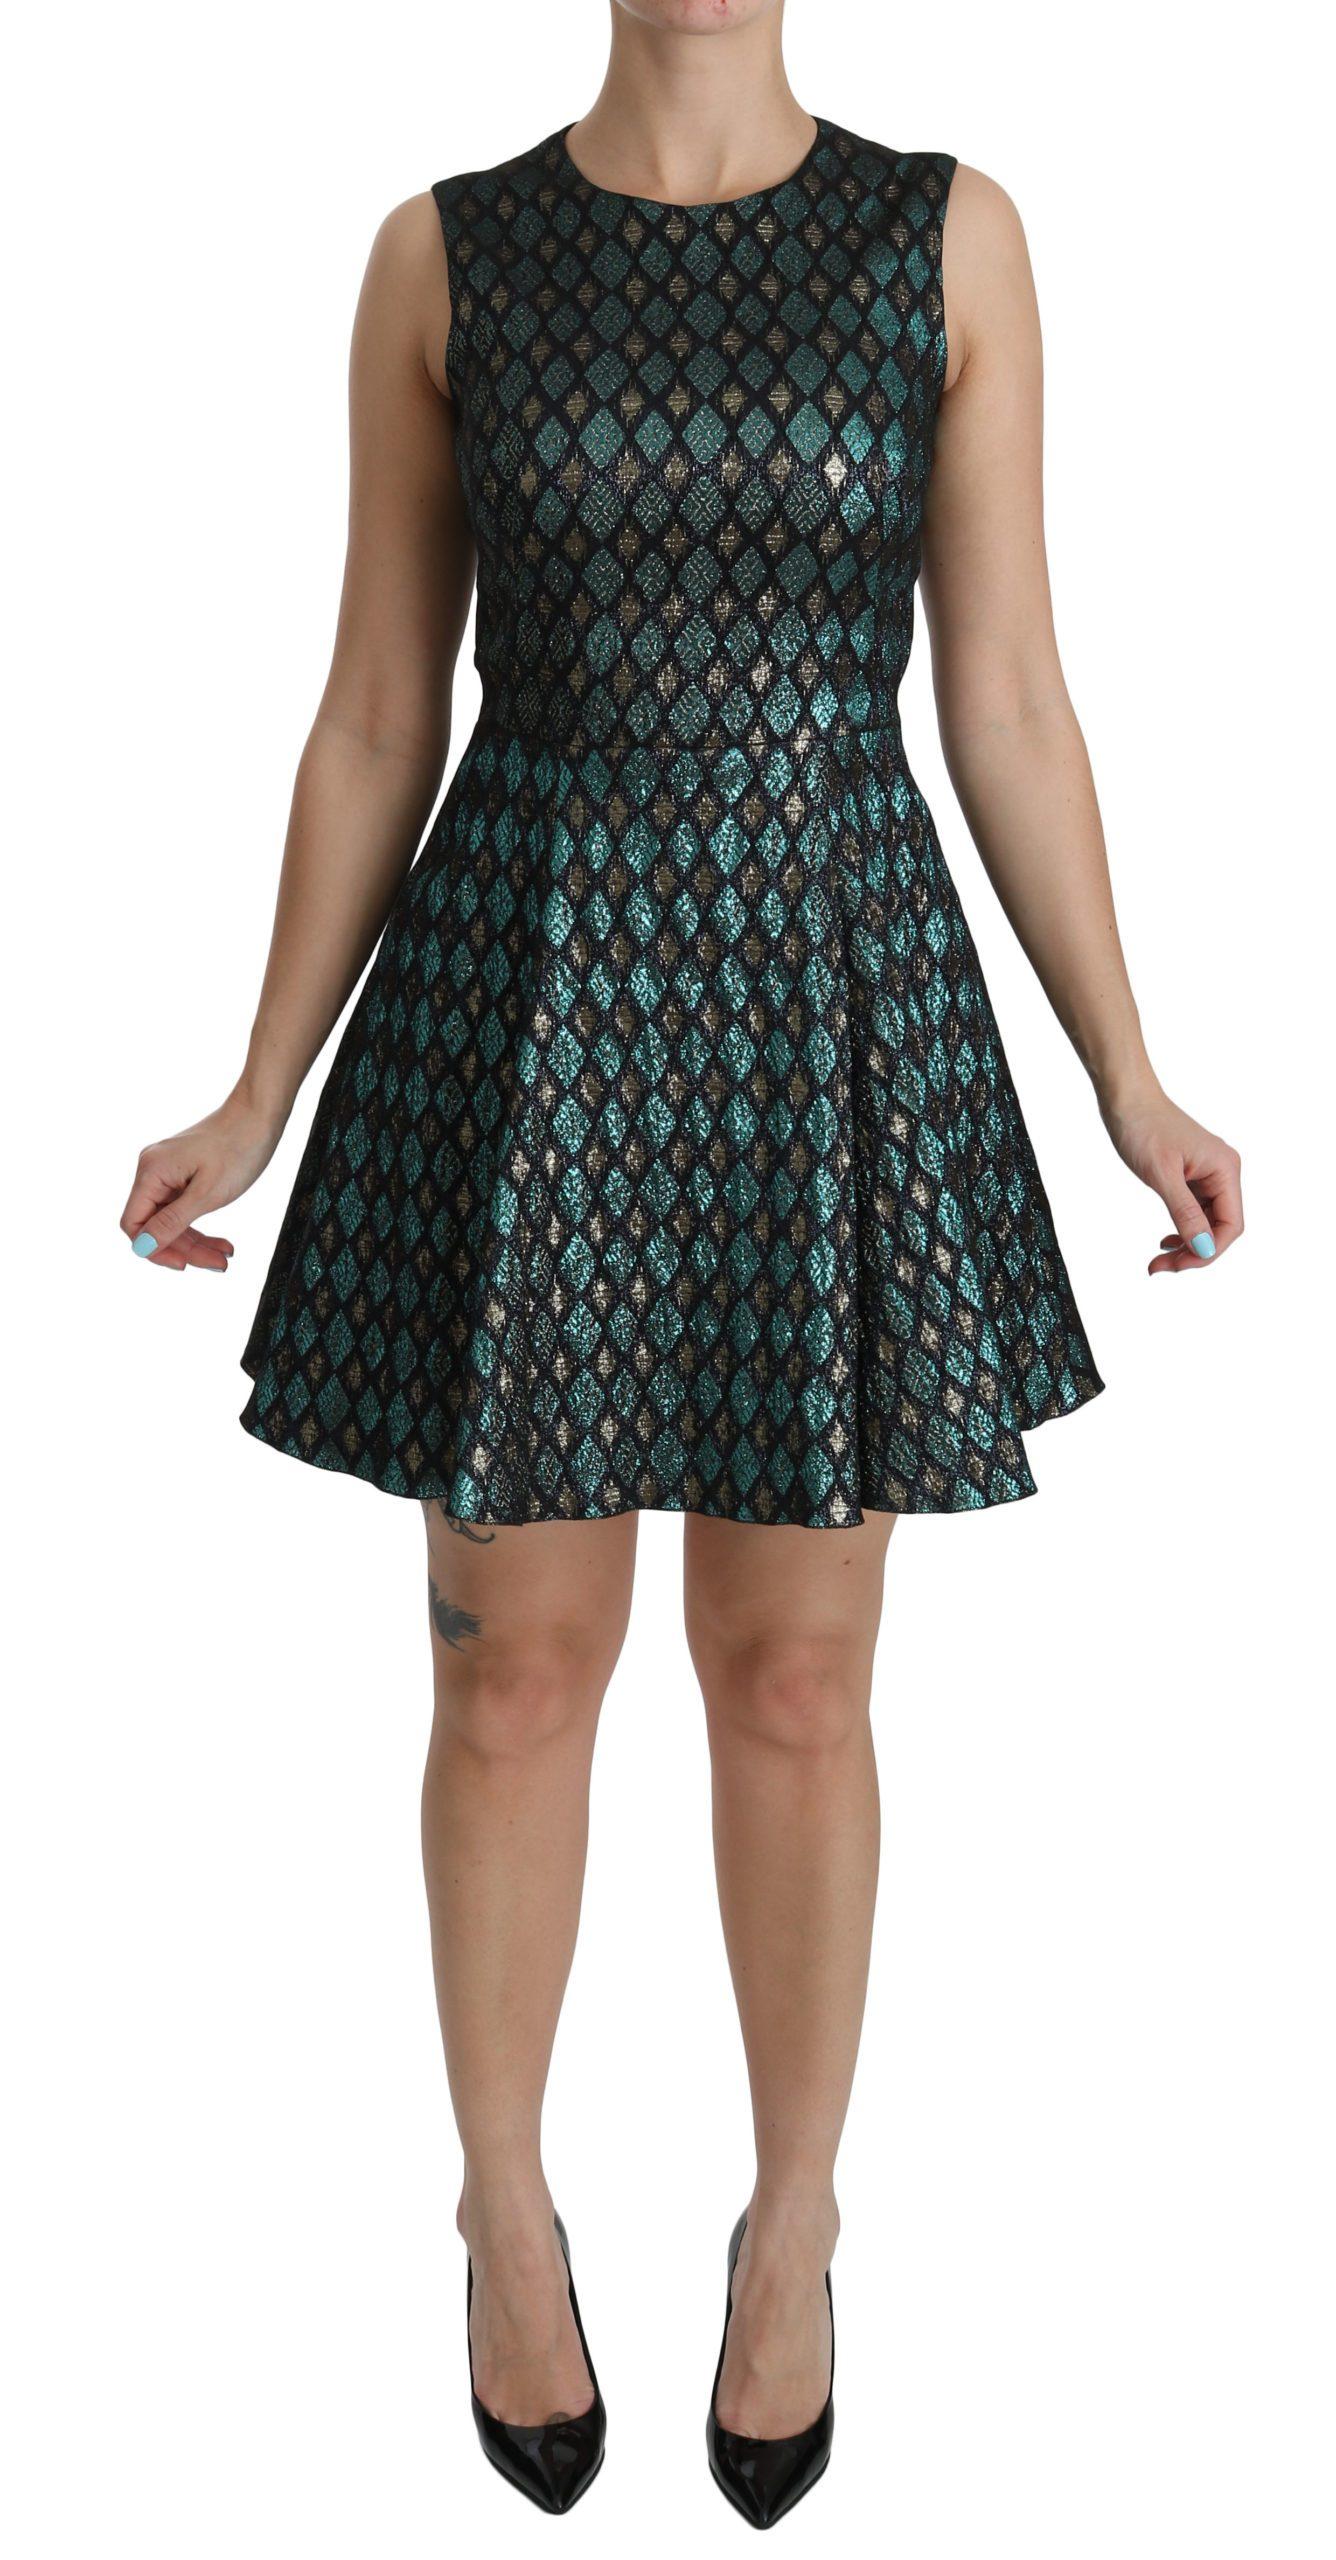 Dolce & Gabbana Women's A-line Shift Gown Dress Blue DR2048 - IT40 S